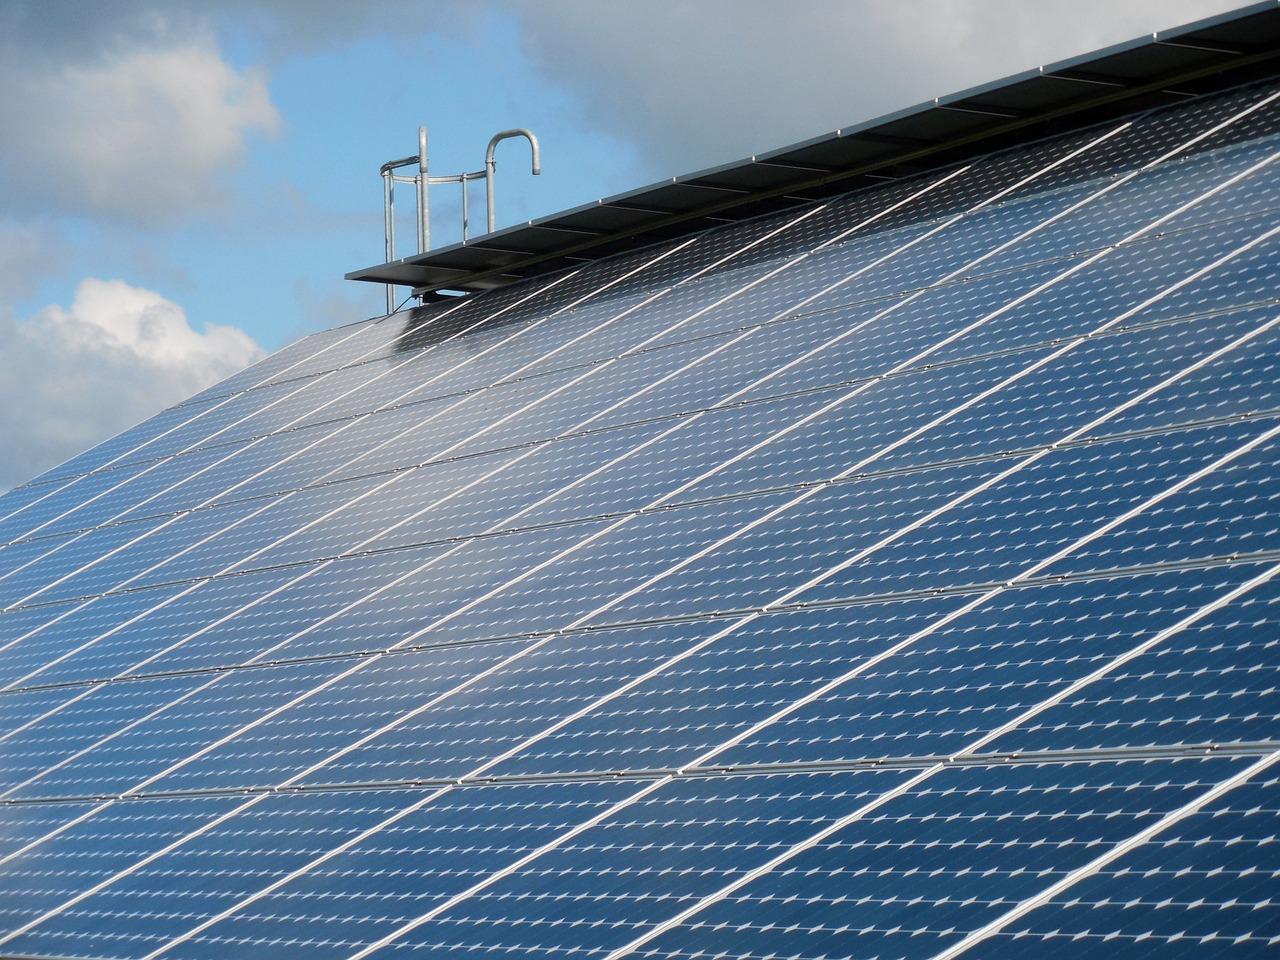 https://www.knorr-sanitaer-heizung.de/wp-content/uploads/2015/08/solar-cells-824691_1280.jpg